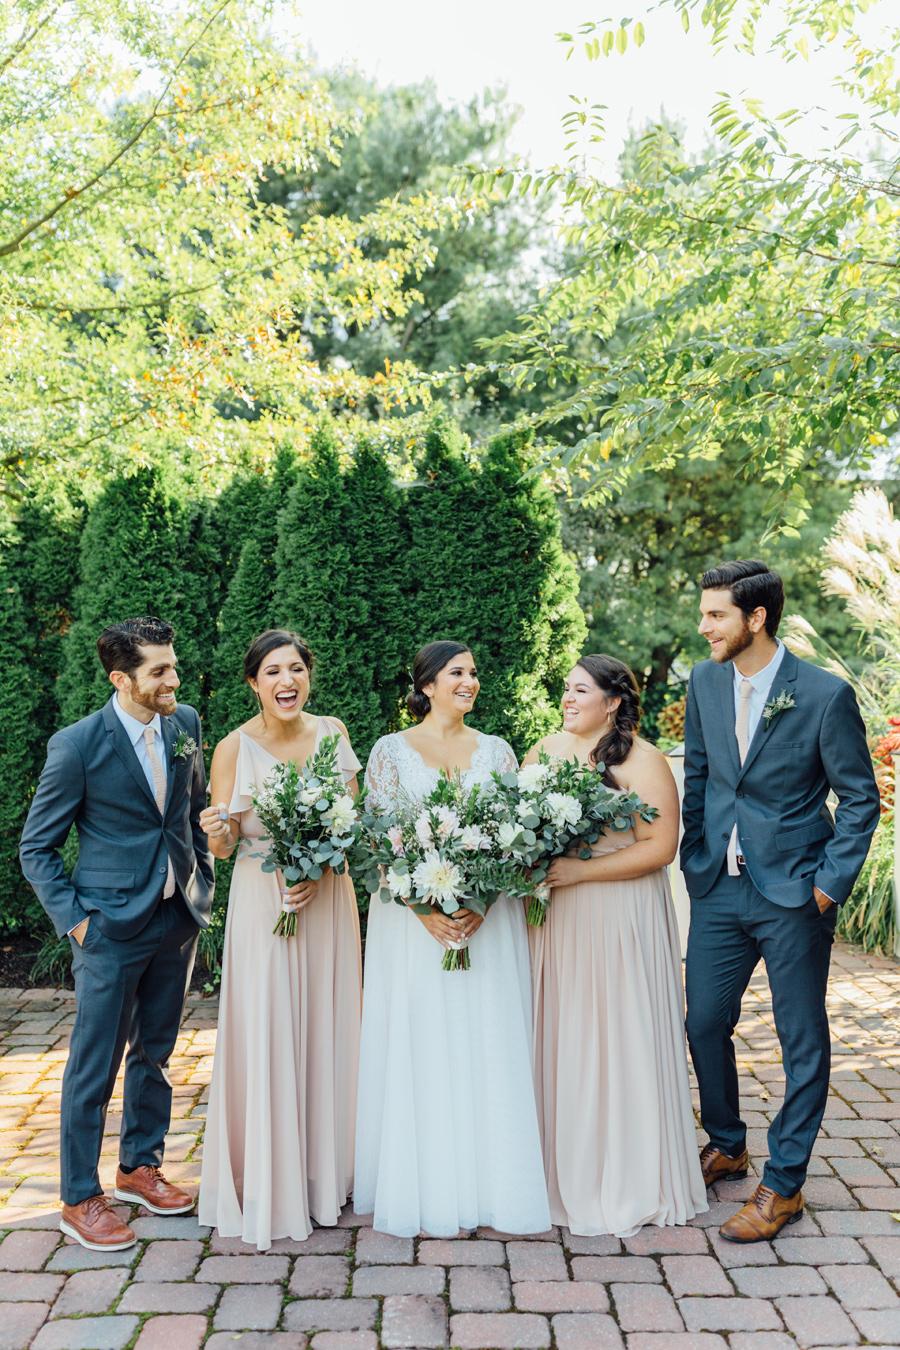 the-inn-at-leola-wedding-lancaster-pennsylvania-wedding-photographer-rebeka-viola-photograhy (26).jpg